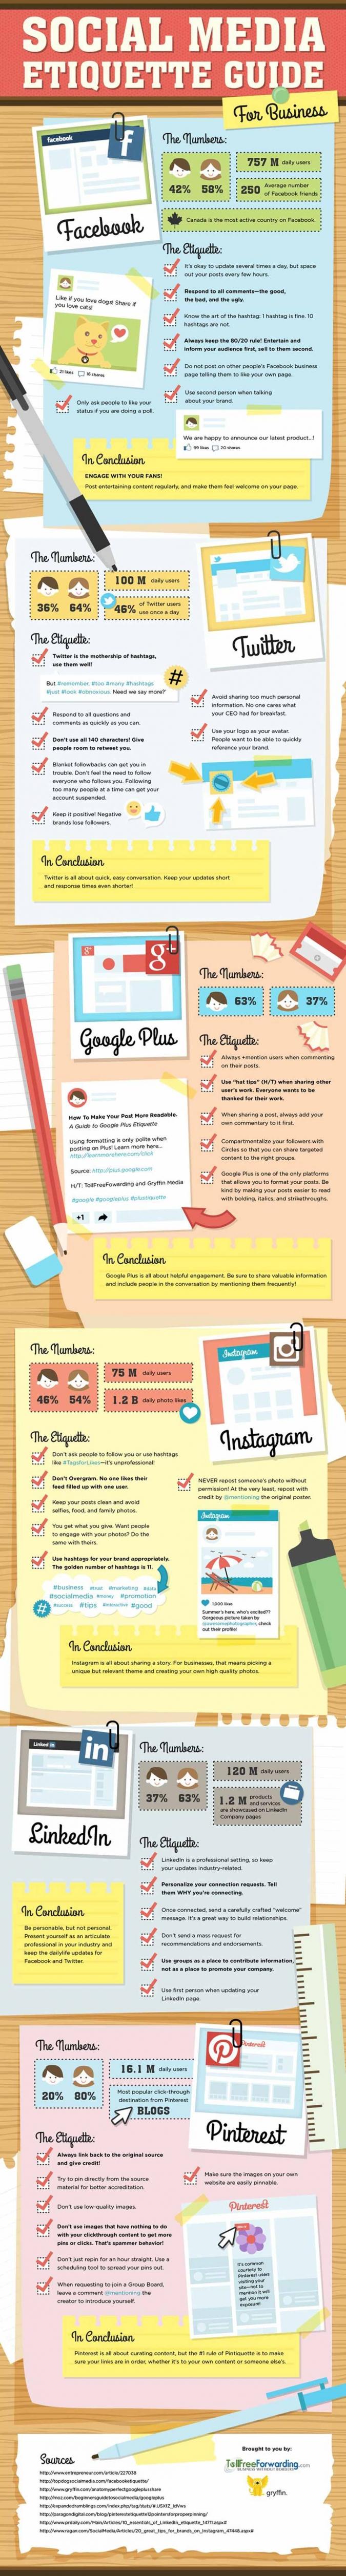 social-media-knigge-unternehmen-tipps-regeln-infografik